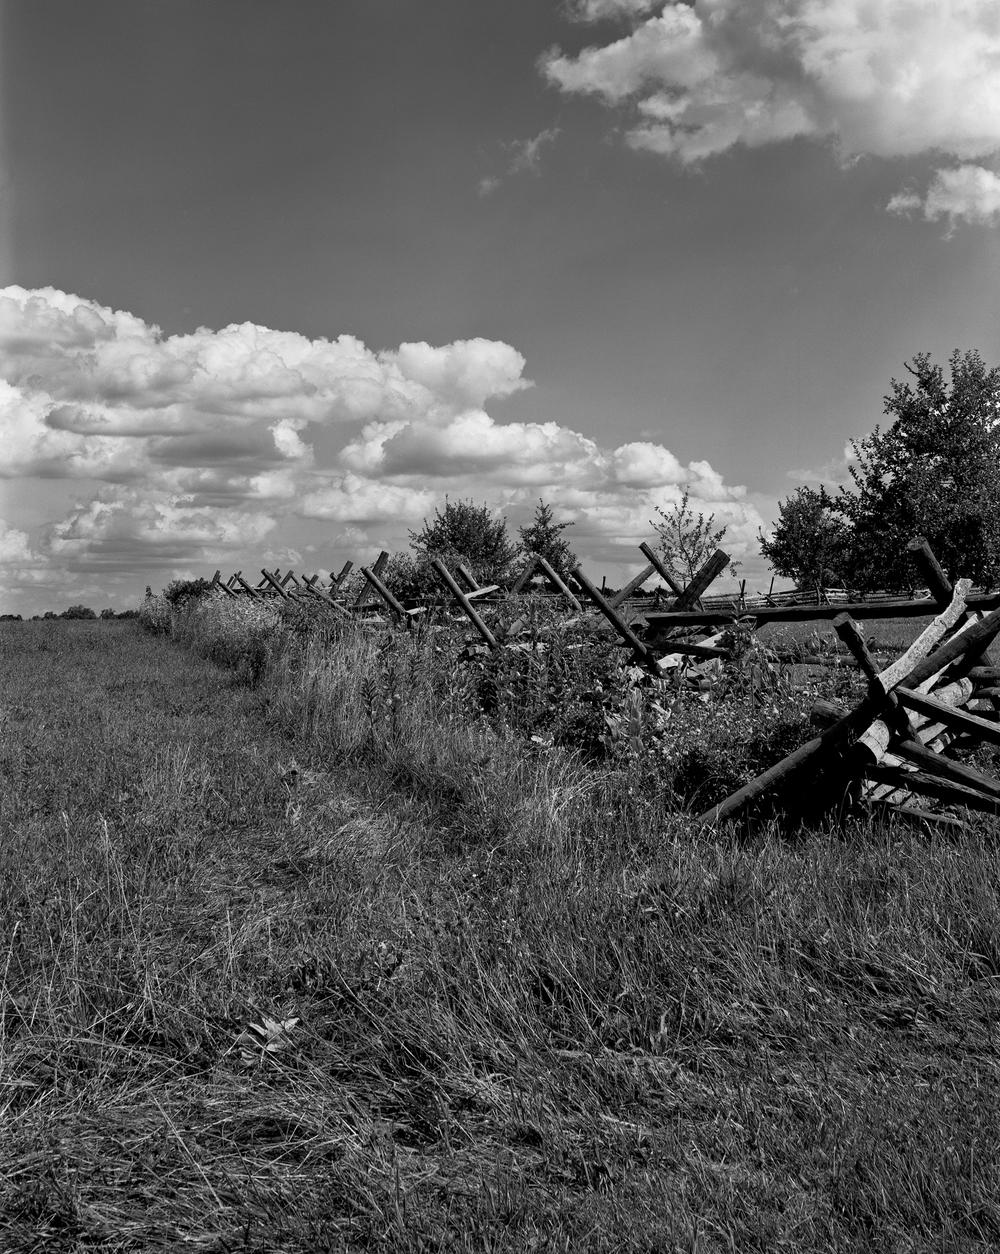 Fencerow at Gettysburg